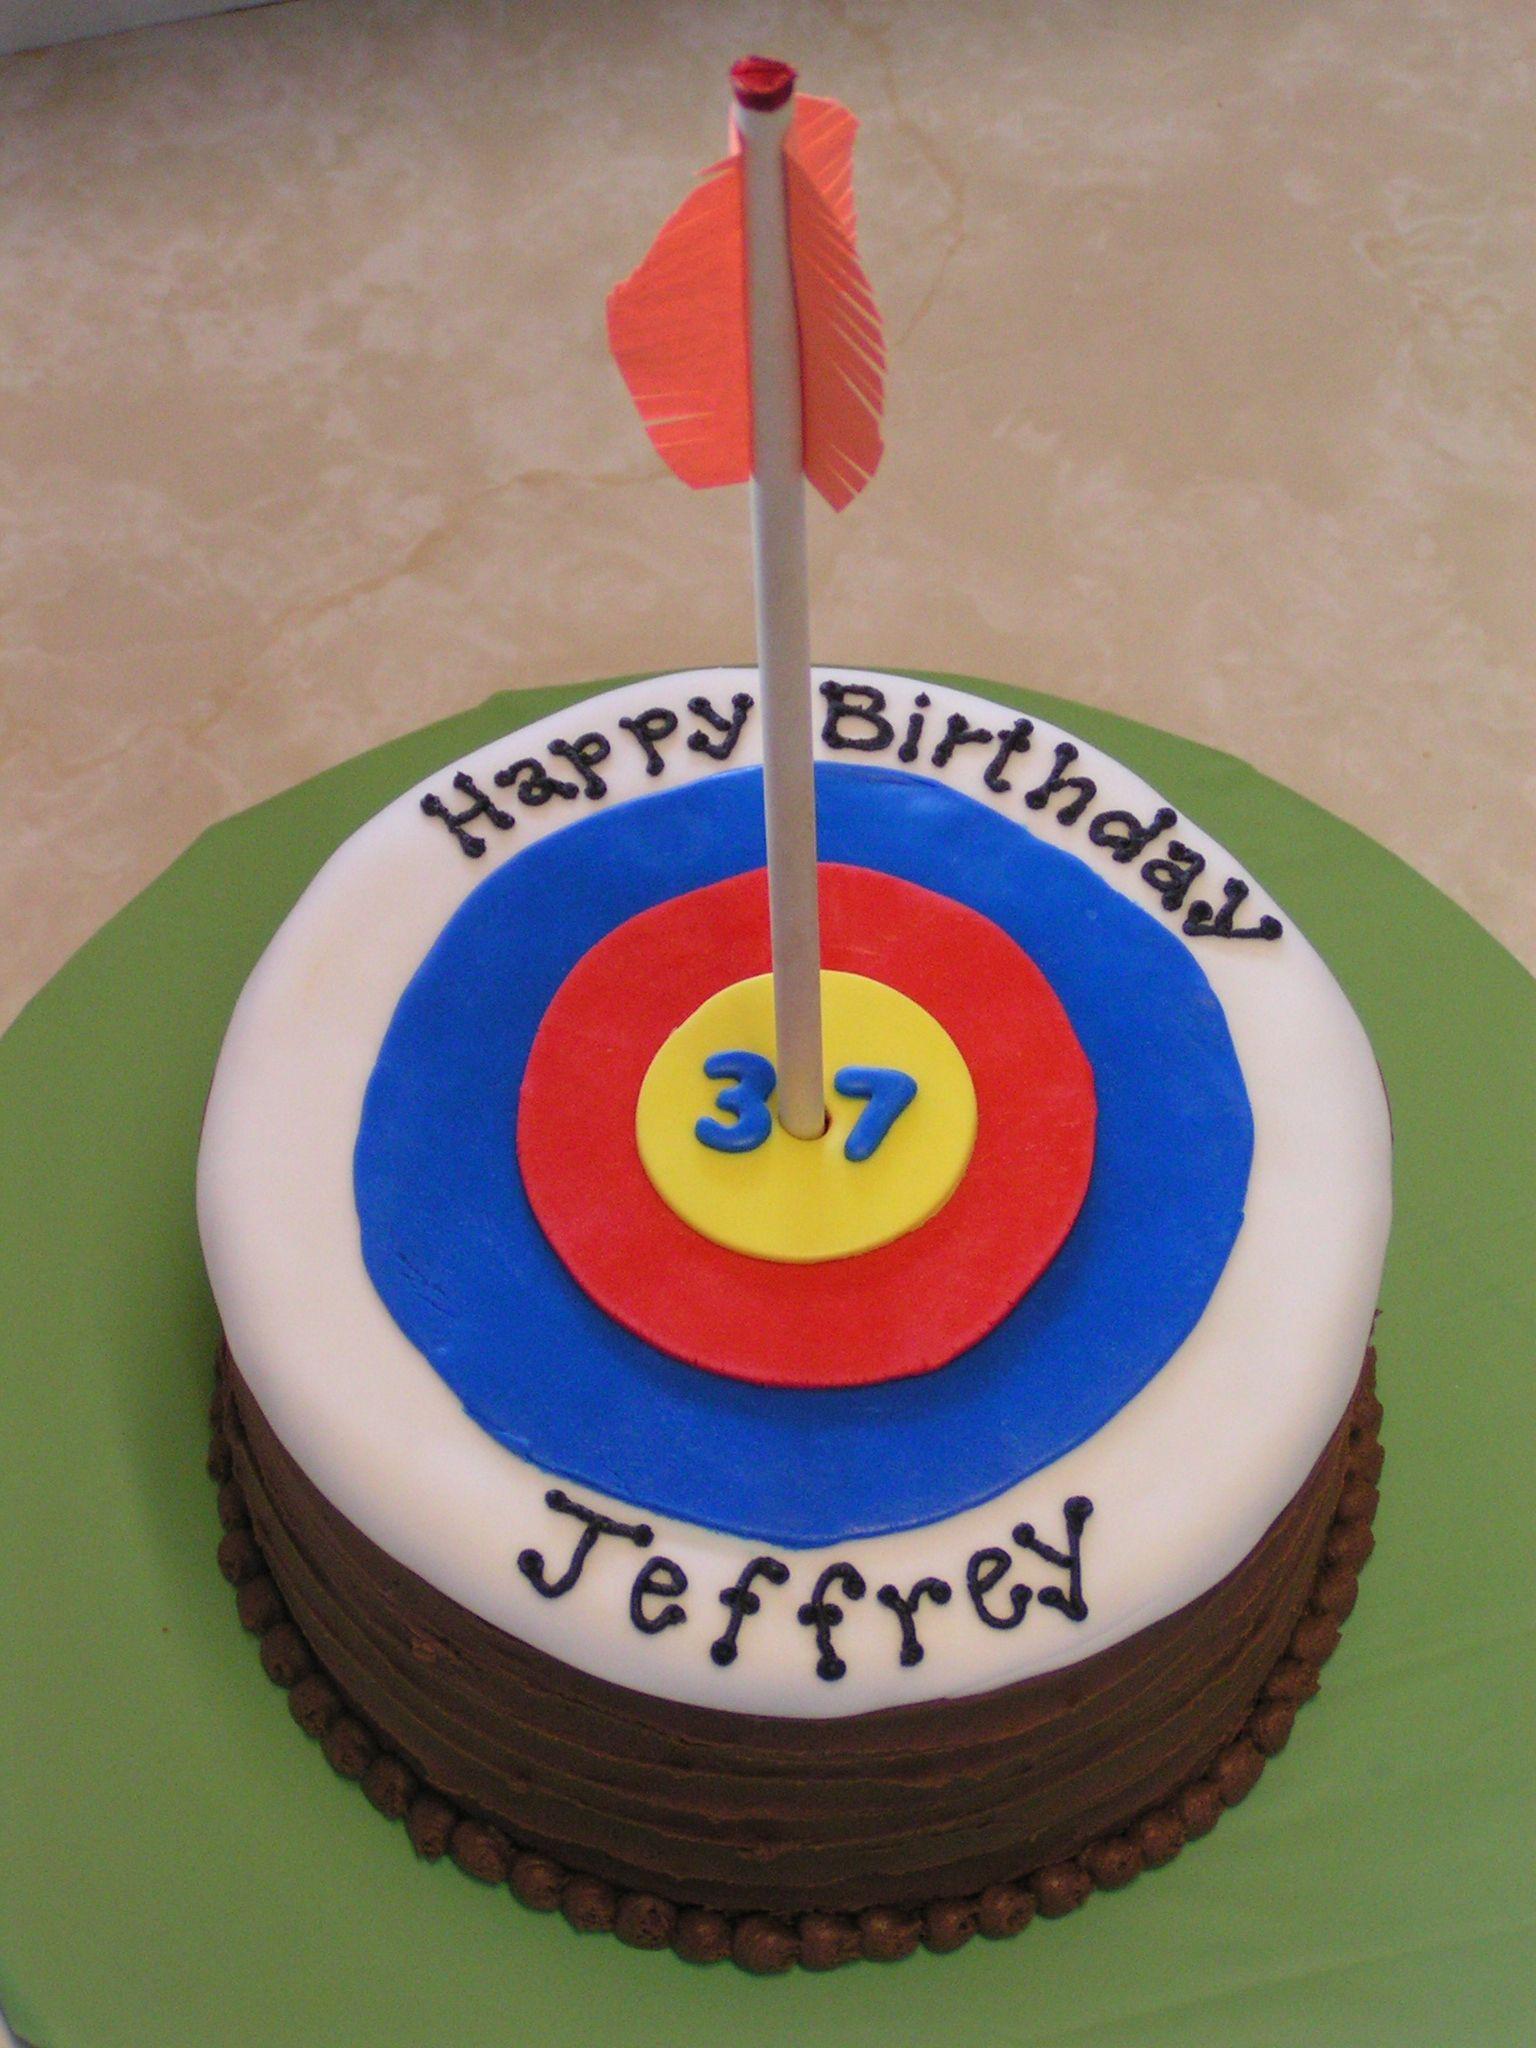 Cake Decorating Bags Target : Archery Target Cake Archery Pinterest Archery, Cake ...